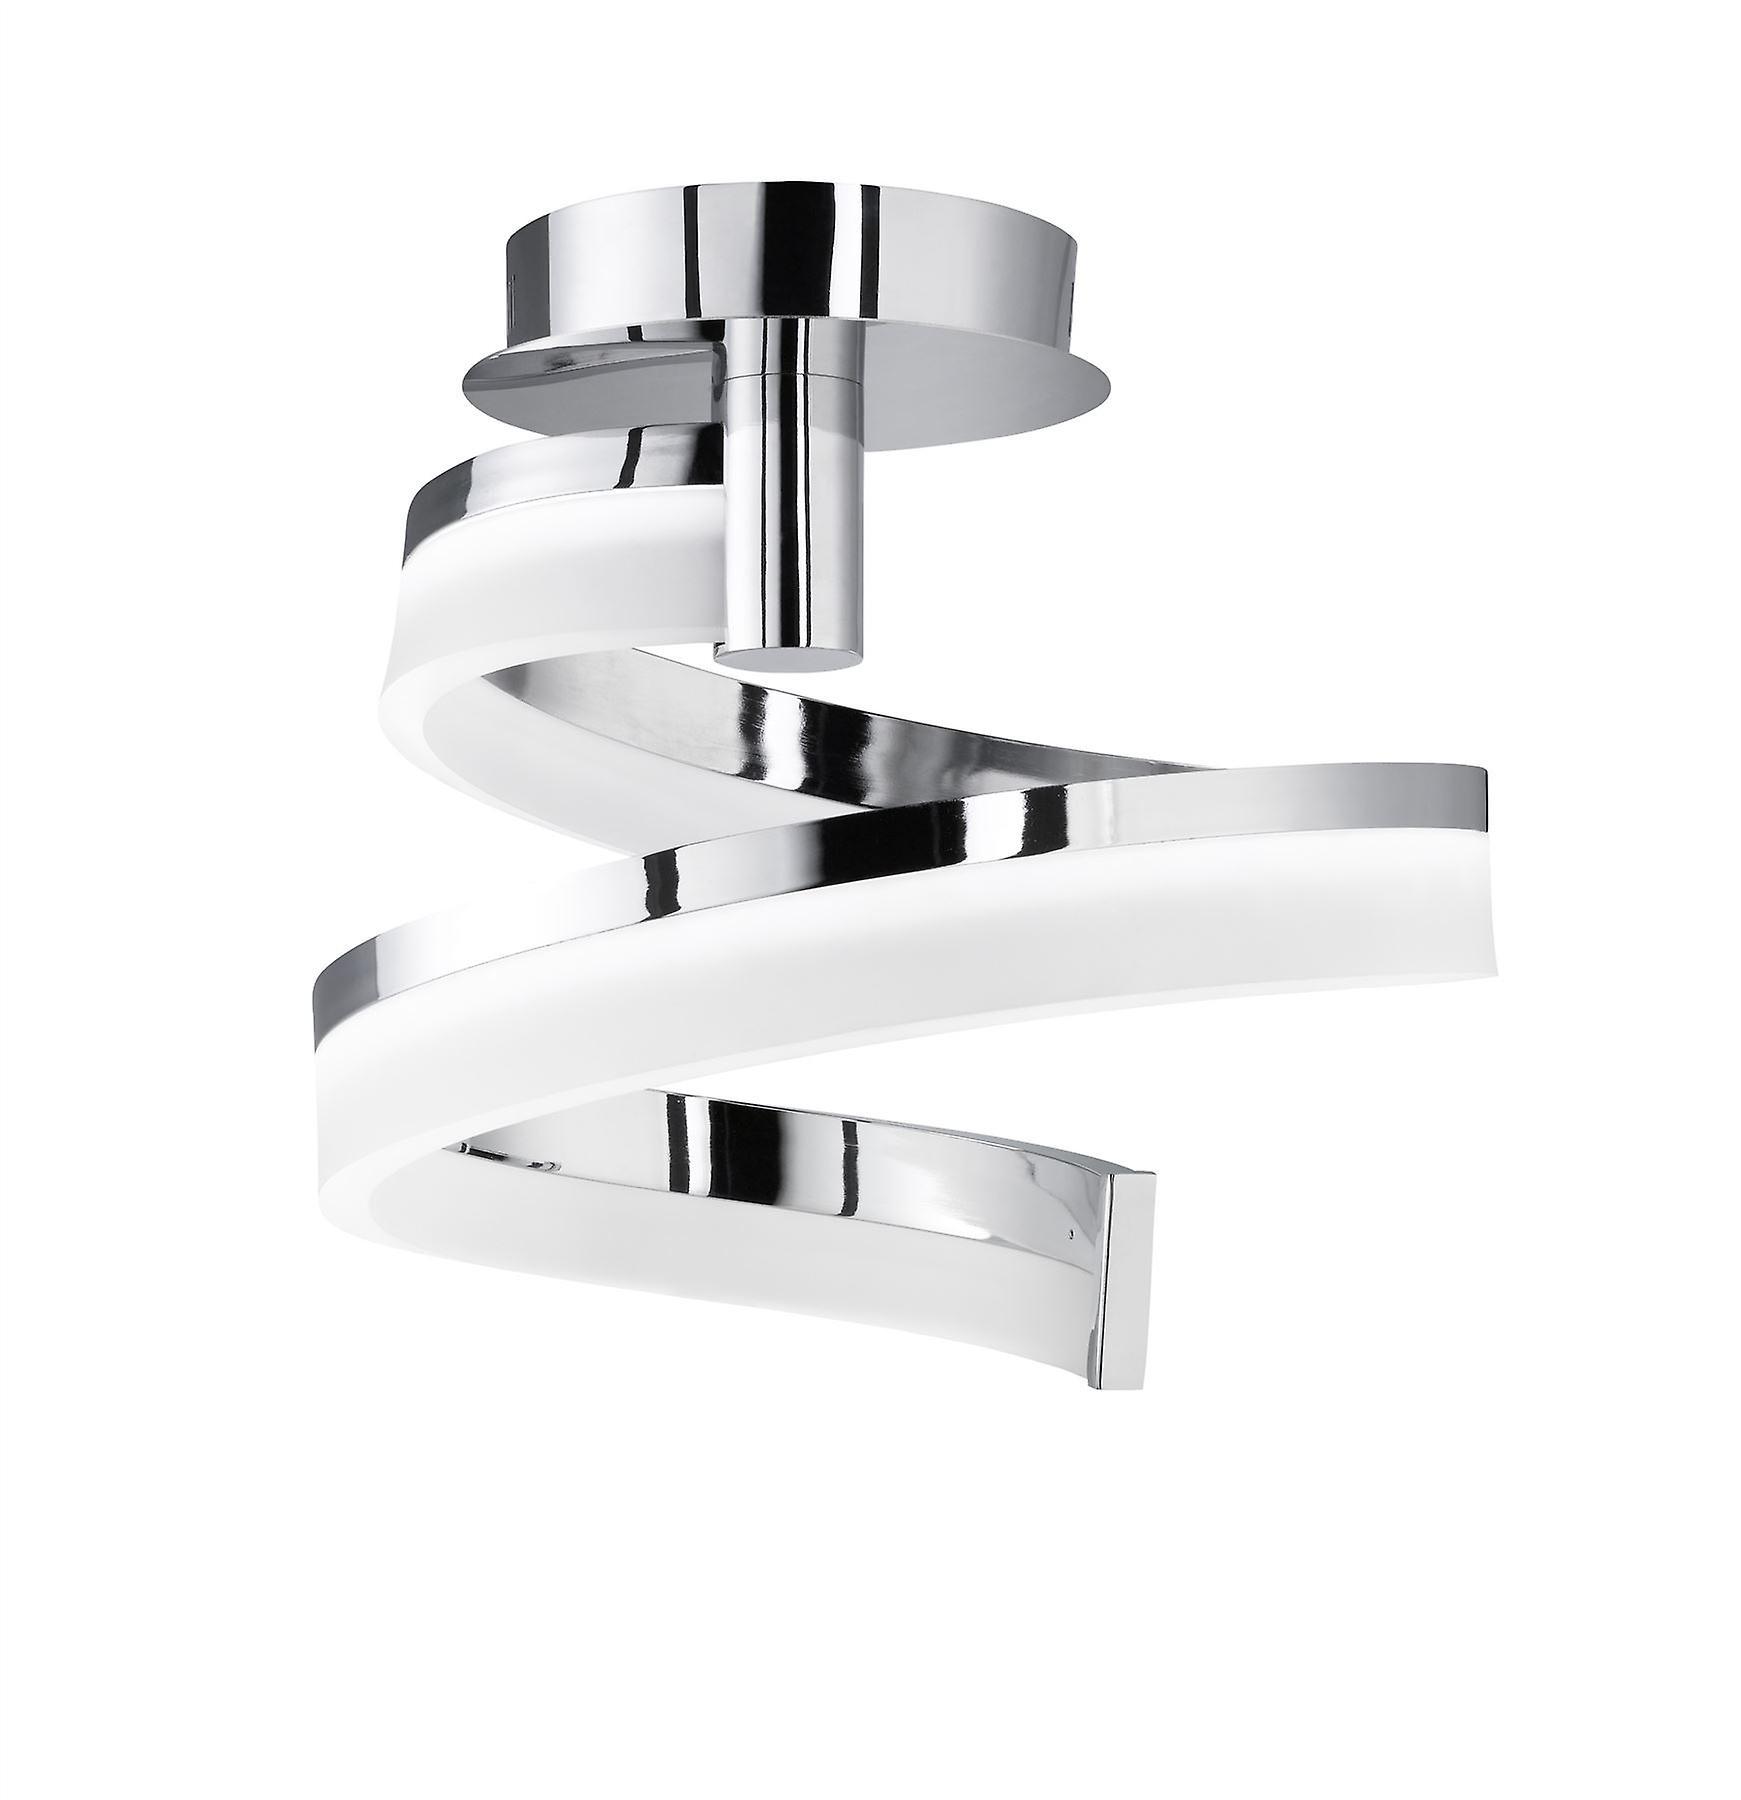 Wofi Fare - Dimmable LED 1 Light Flush Plafond Lumière Chrome - 9032.01.01.5000